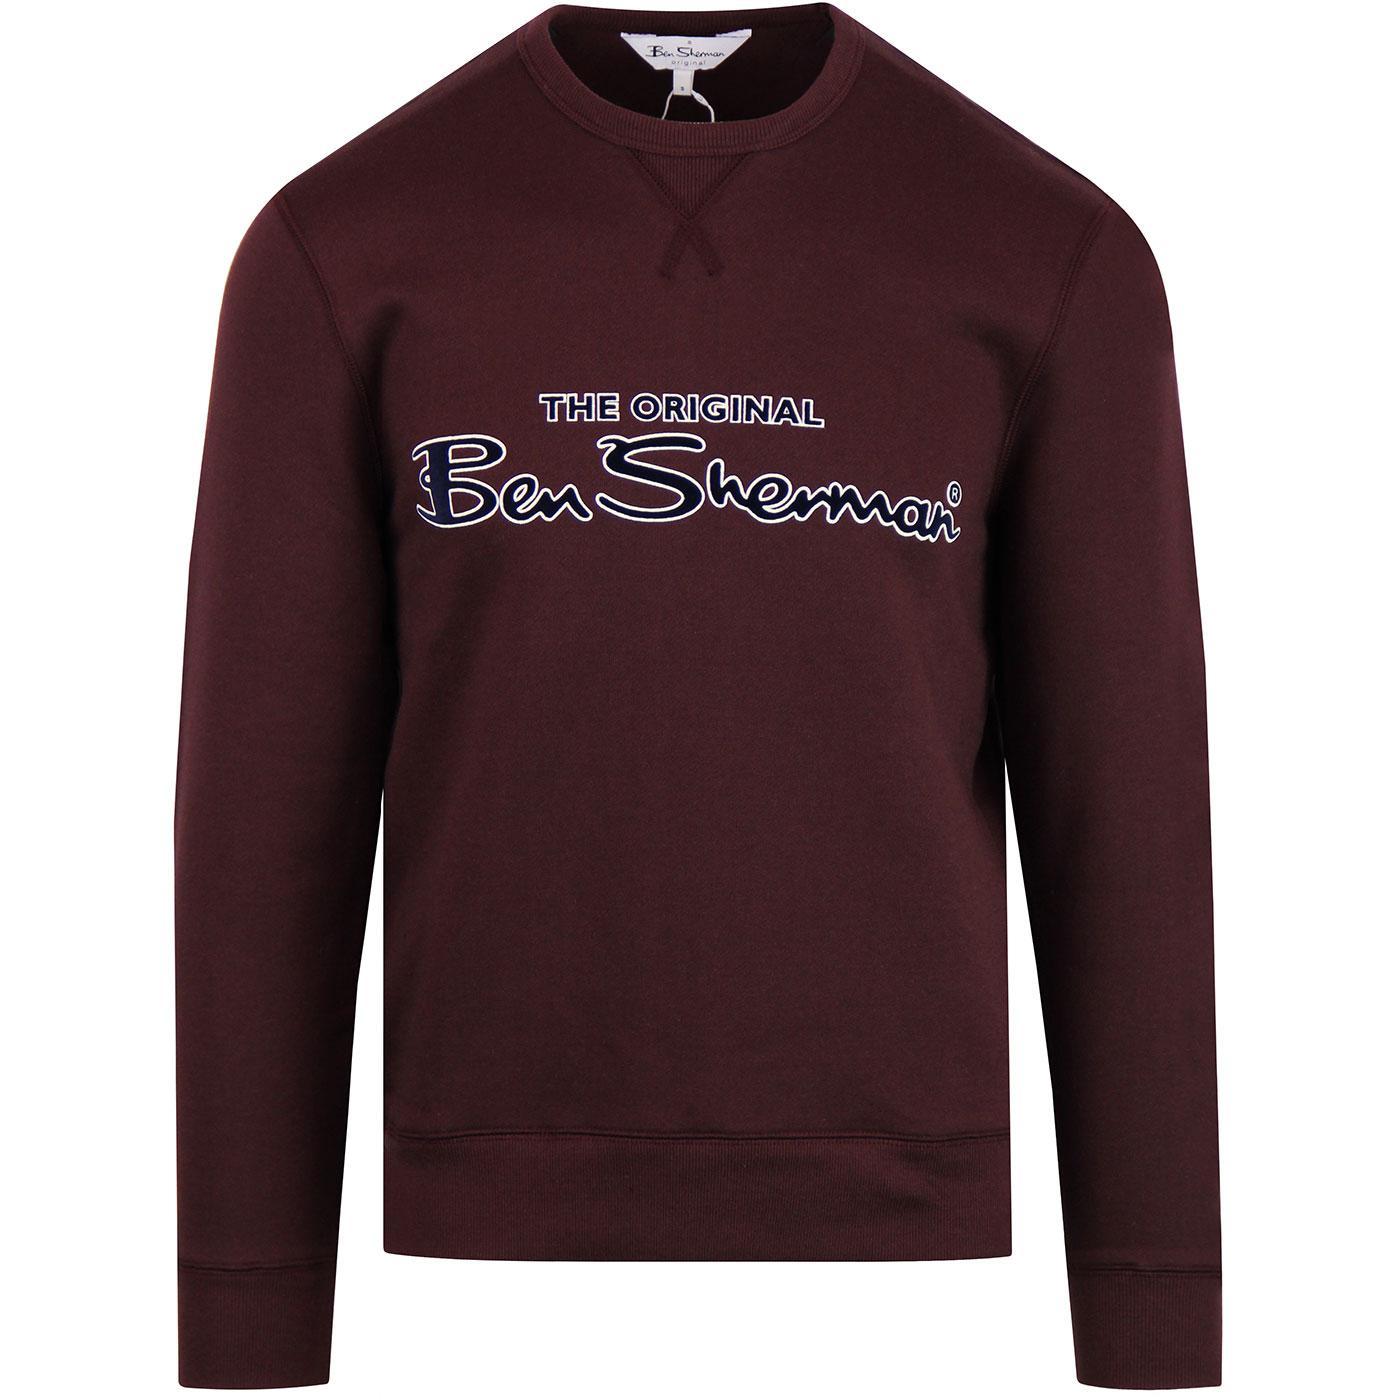 BEN SHERMAN Retro 90s Archive Sweatshirt DARK RED